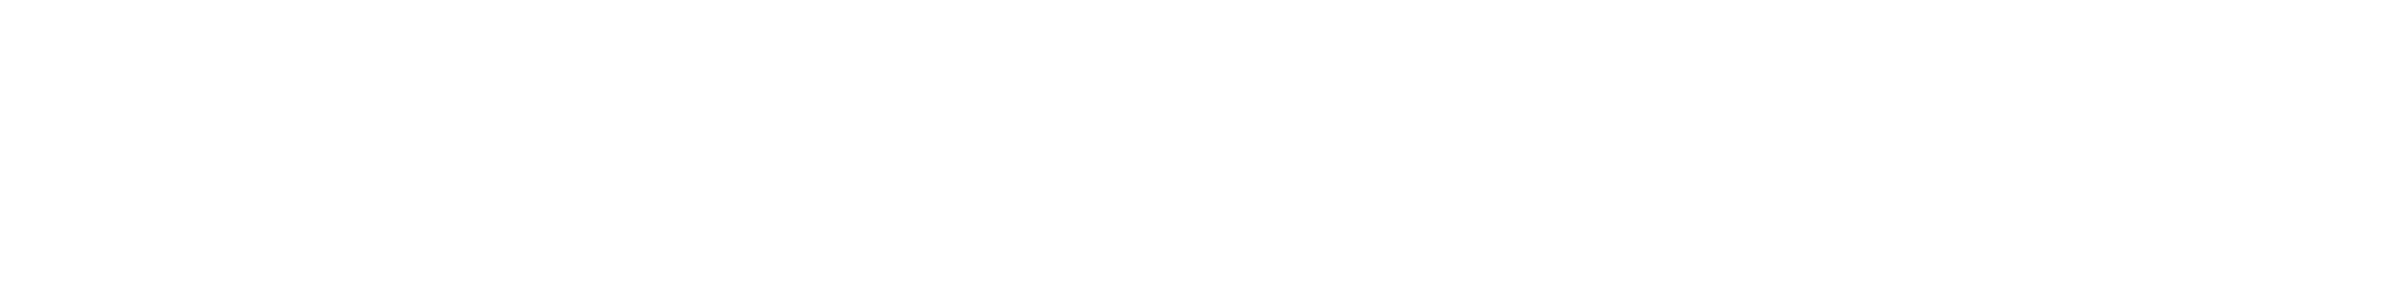 CT Wind Visor Deflectors Set of 2-Piece Window Air Guard Deflectors for Protection Against Snow Sun and Rain Compatible with Mitsubishi Delica 1986-1999 Car Ventvisor Door Side Dark Smoke